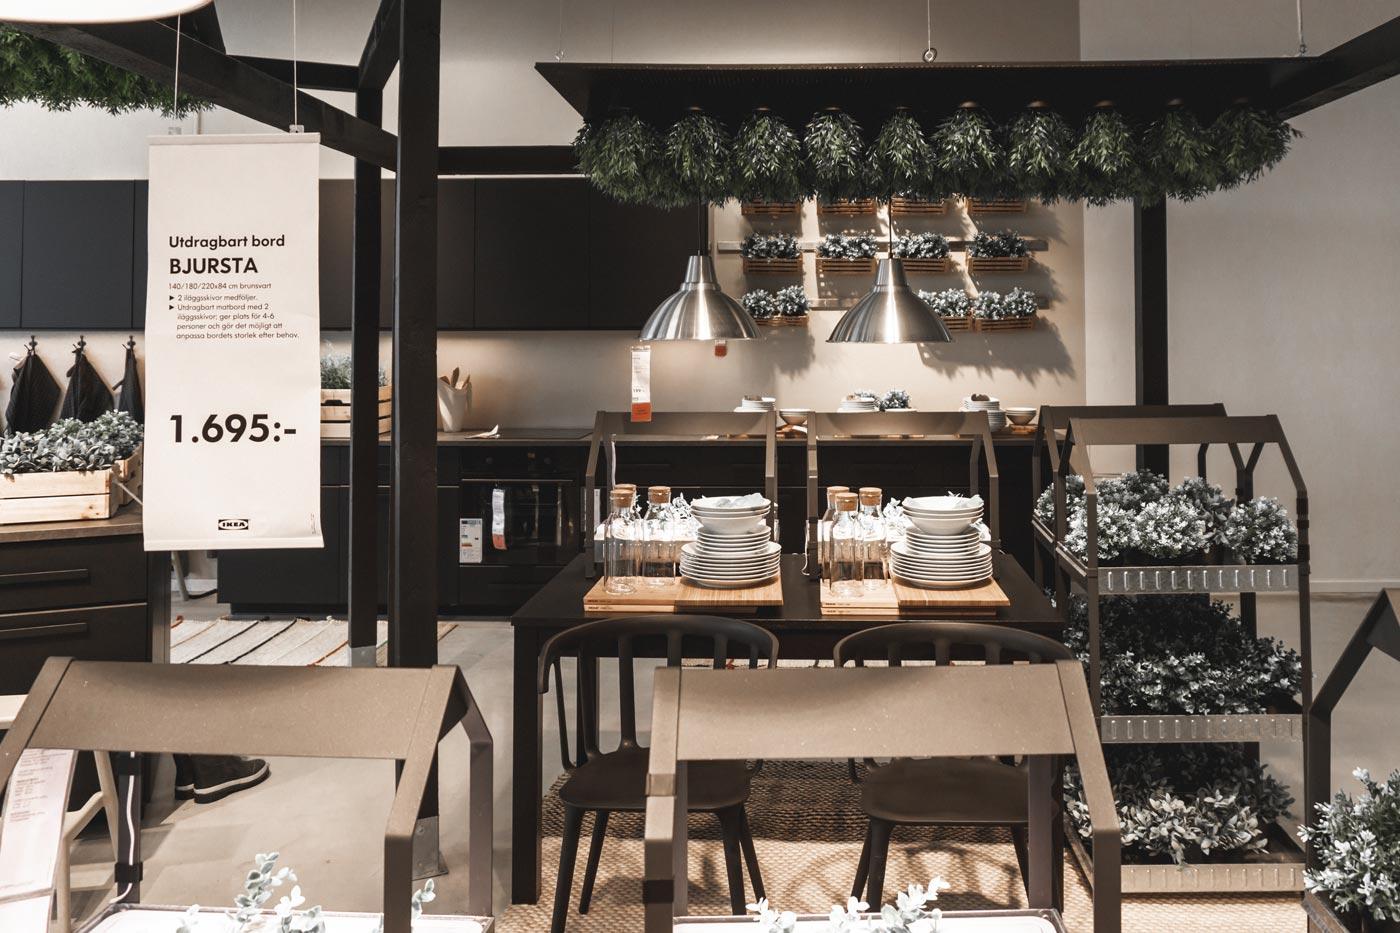 Ikea Besuch in Schweden Reisebericht